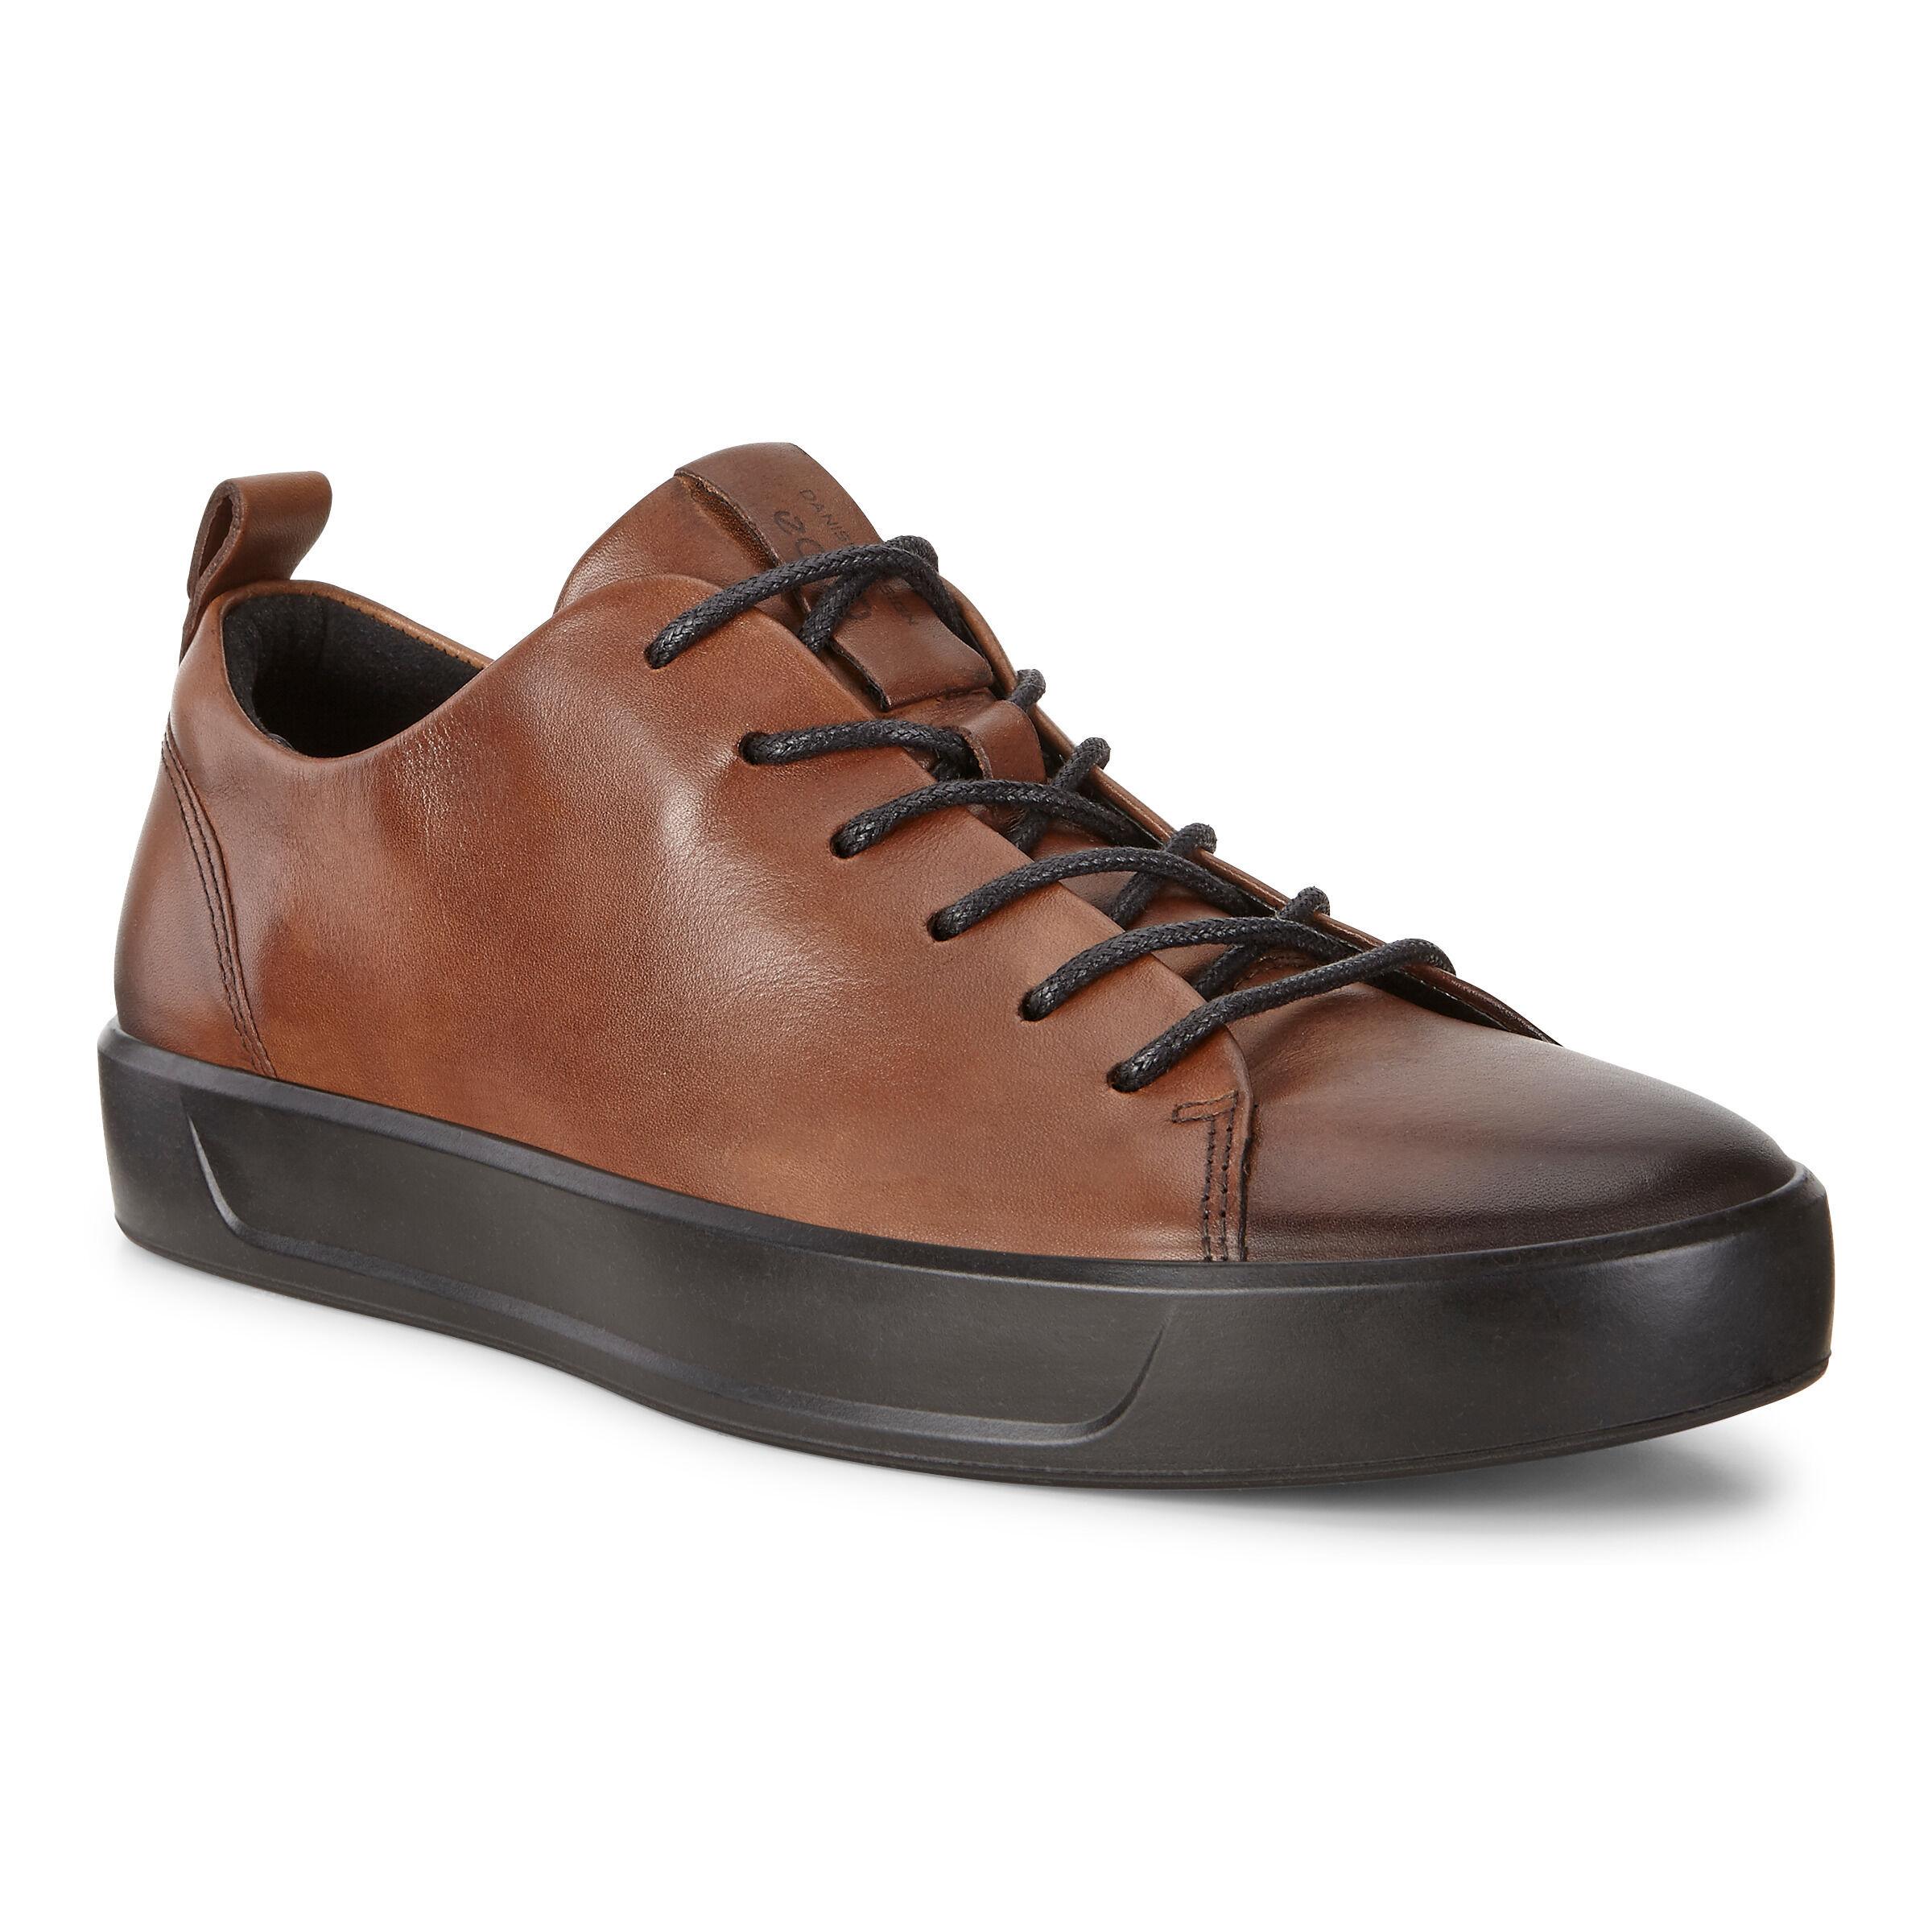 Ecco 2.0 Basses Chaussures De Sport Noir Ecco VmOvhk